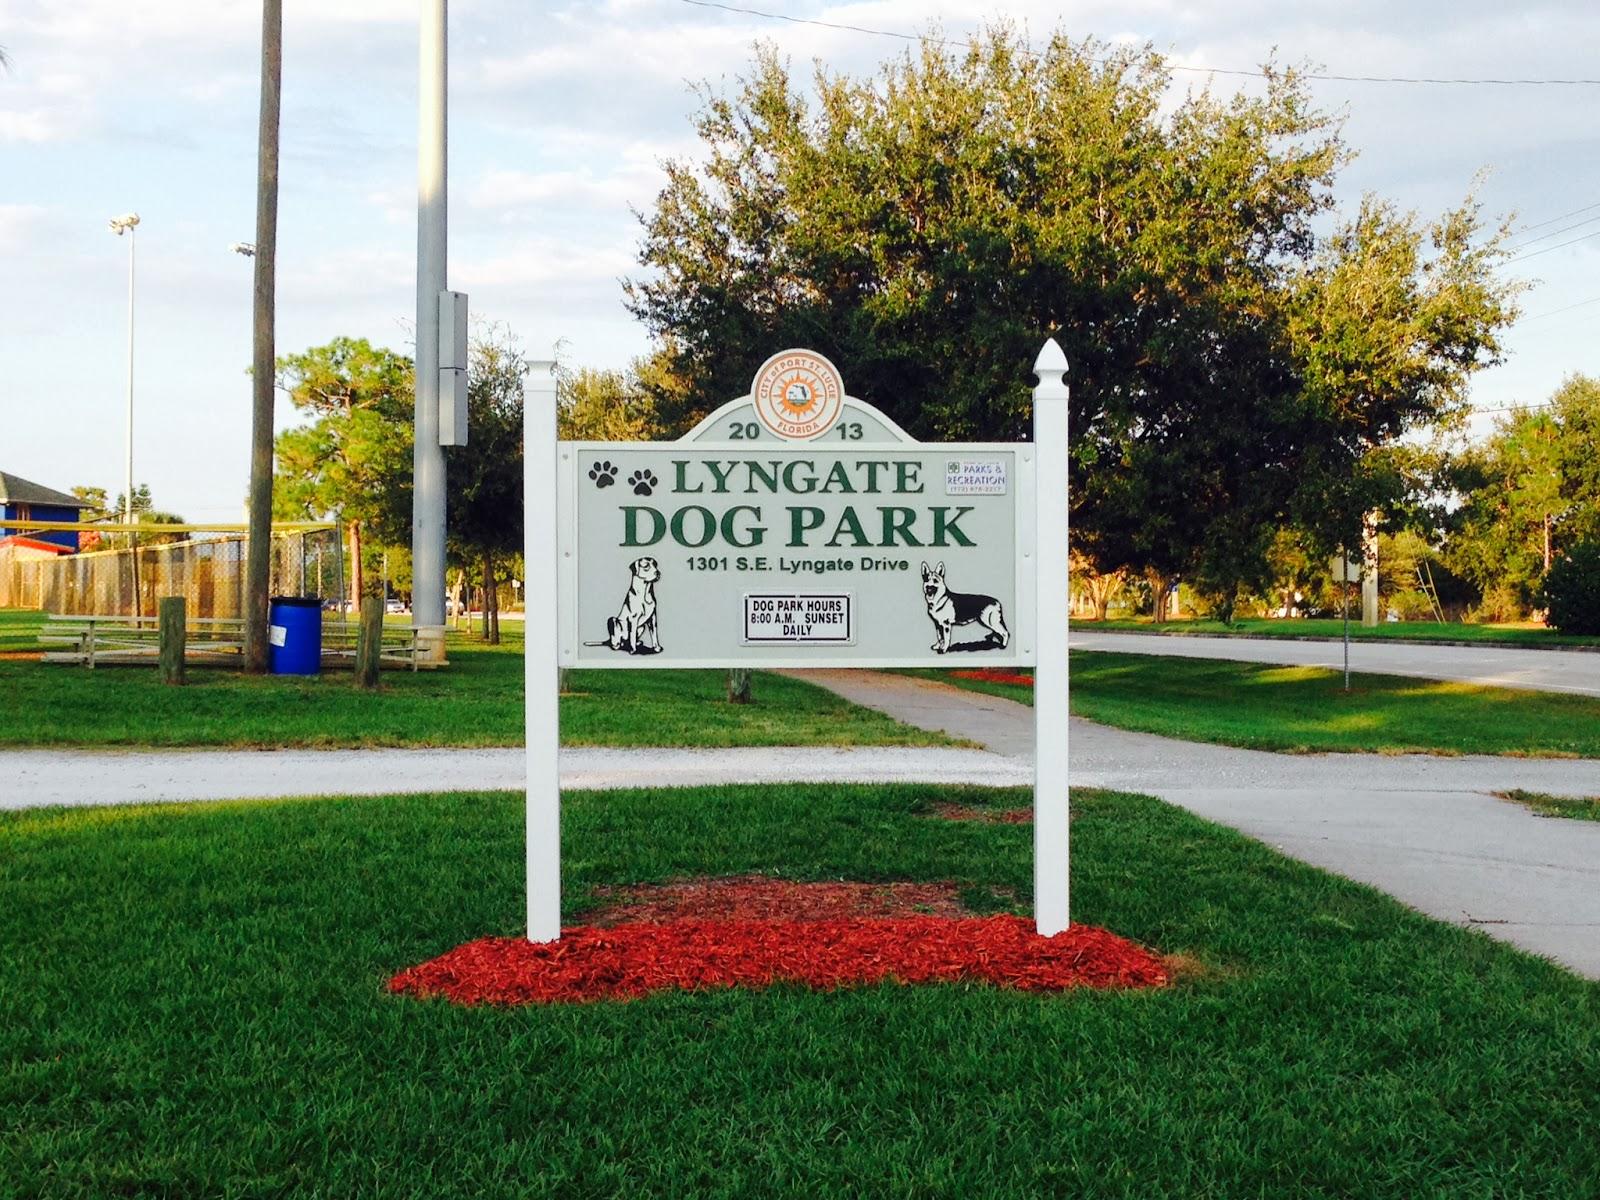 SNEAK PEAK: Lyngate Dog Park Opens Tomorrow | The Treasure Coast ...